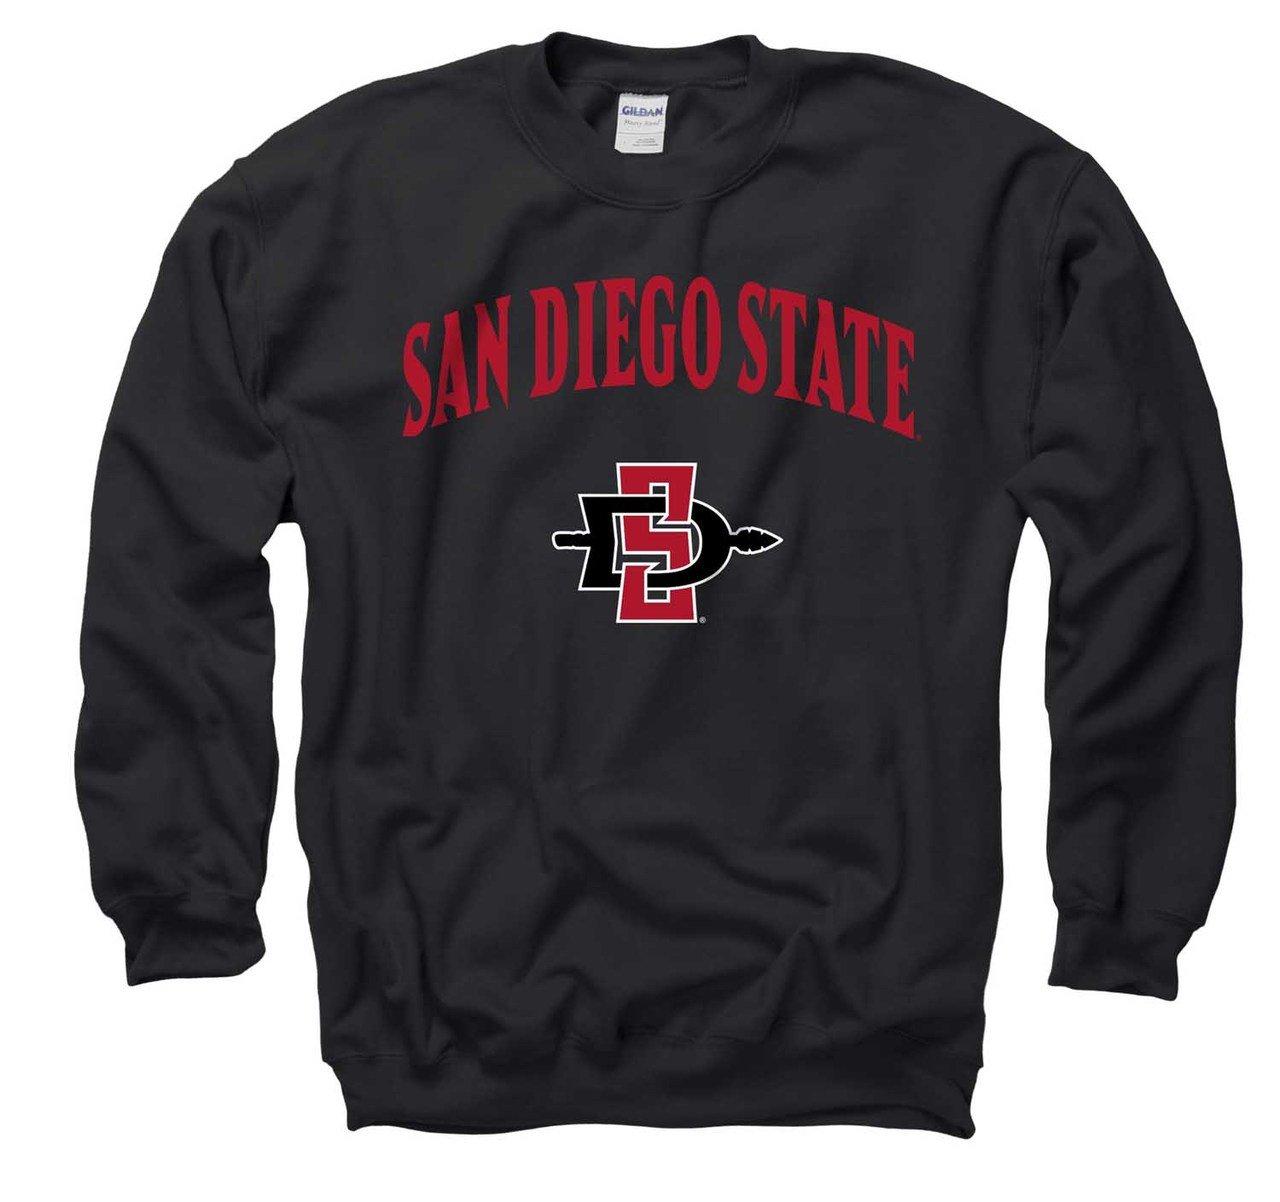 Campus Colors San Diego State Aztecs Arch Logo Gameday Crewneck Sweatshirt Black